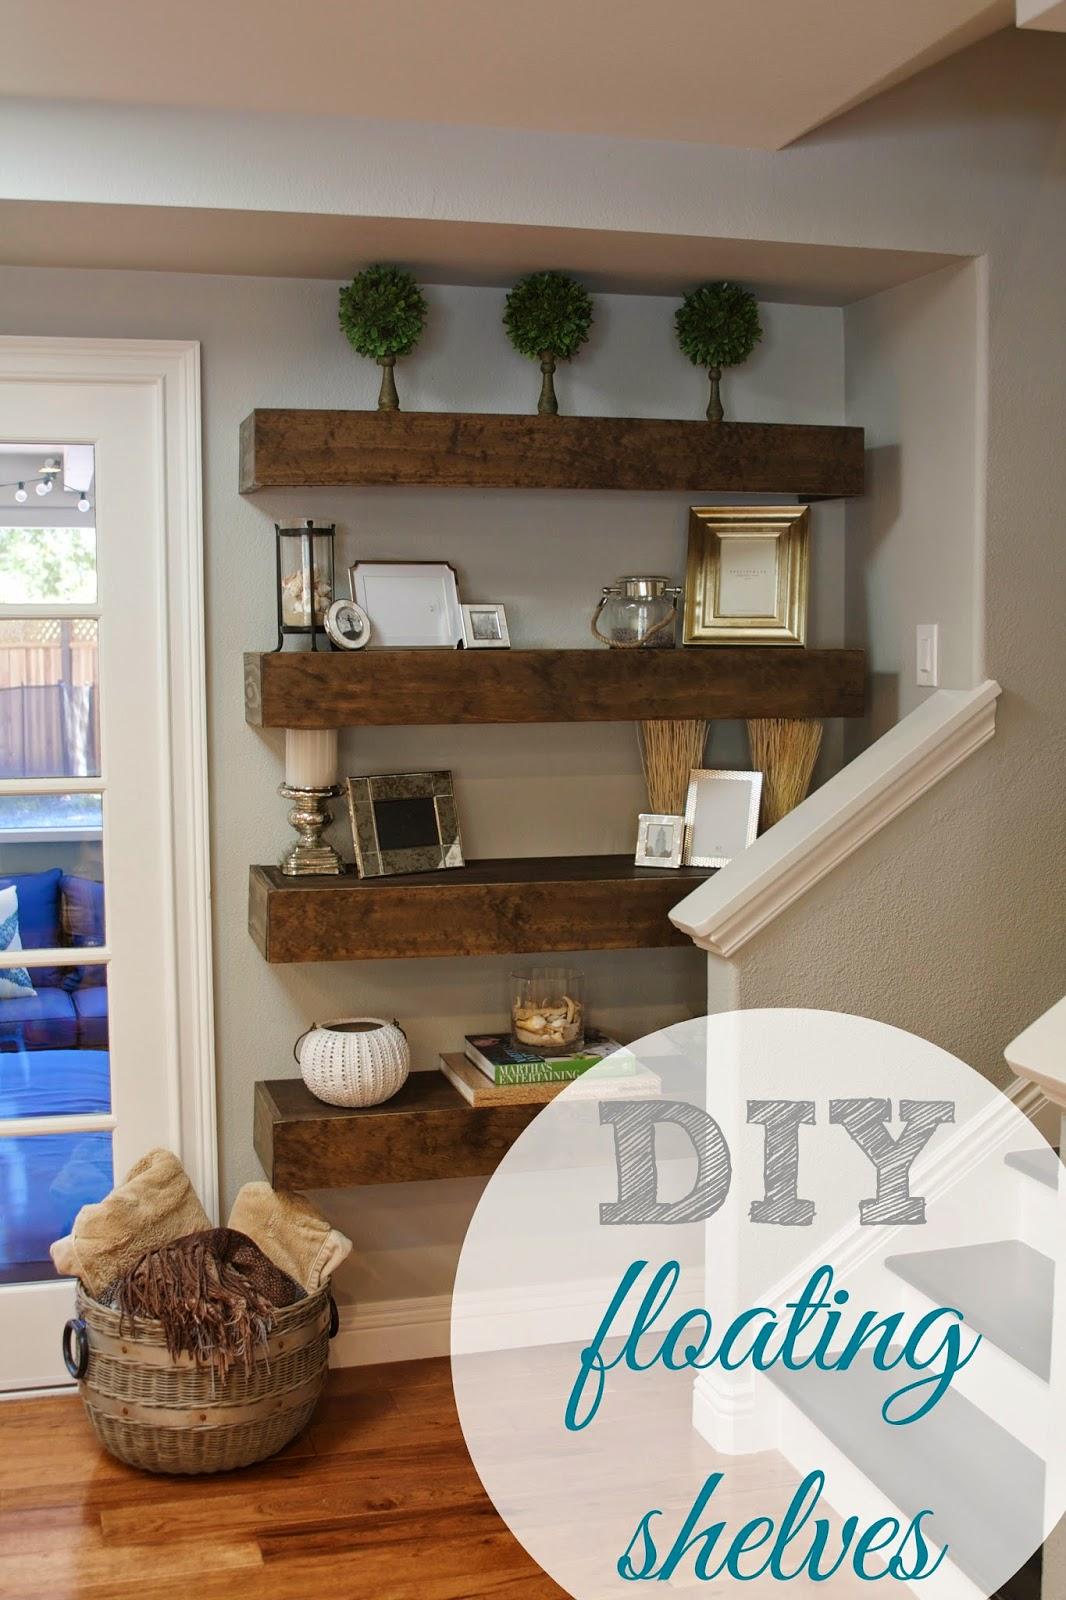 Shelves In The Living Room: Day 27 - Shelves {31 Cheap & Easy DIY Organizers}